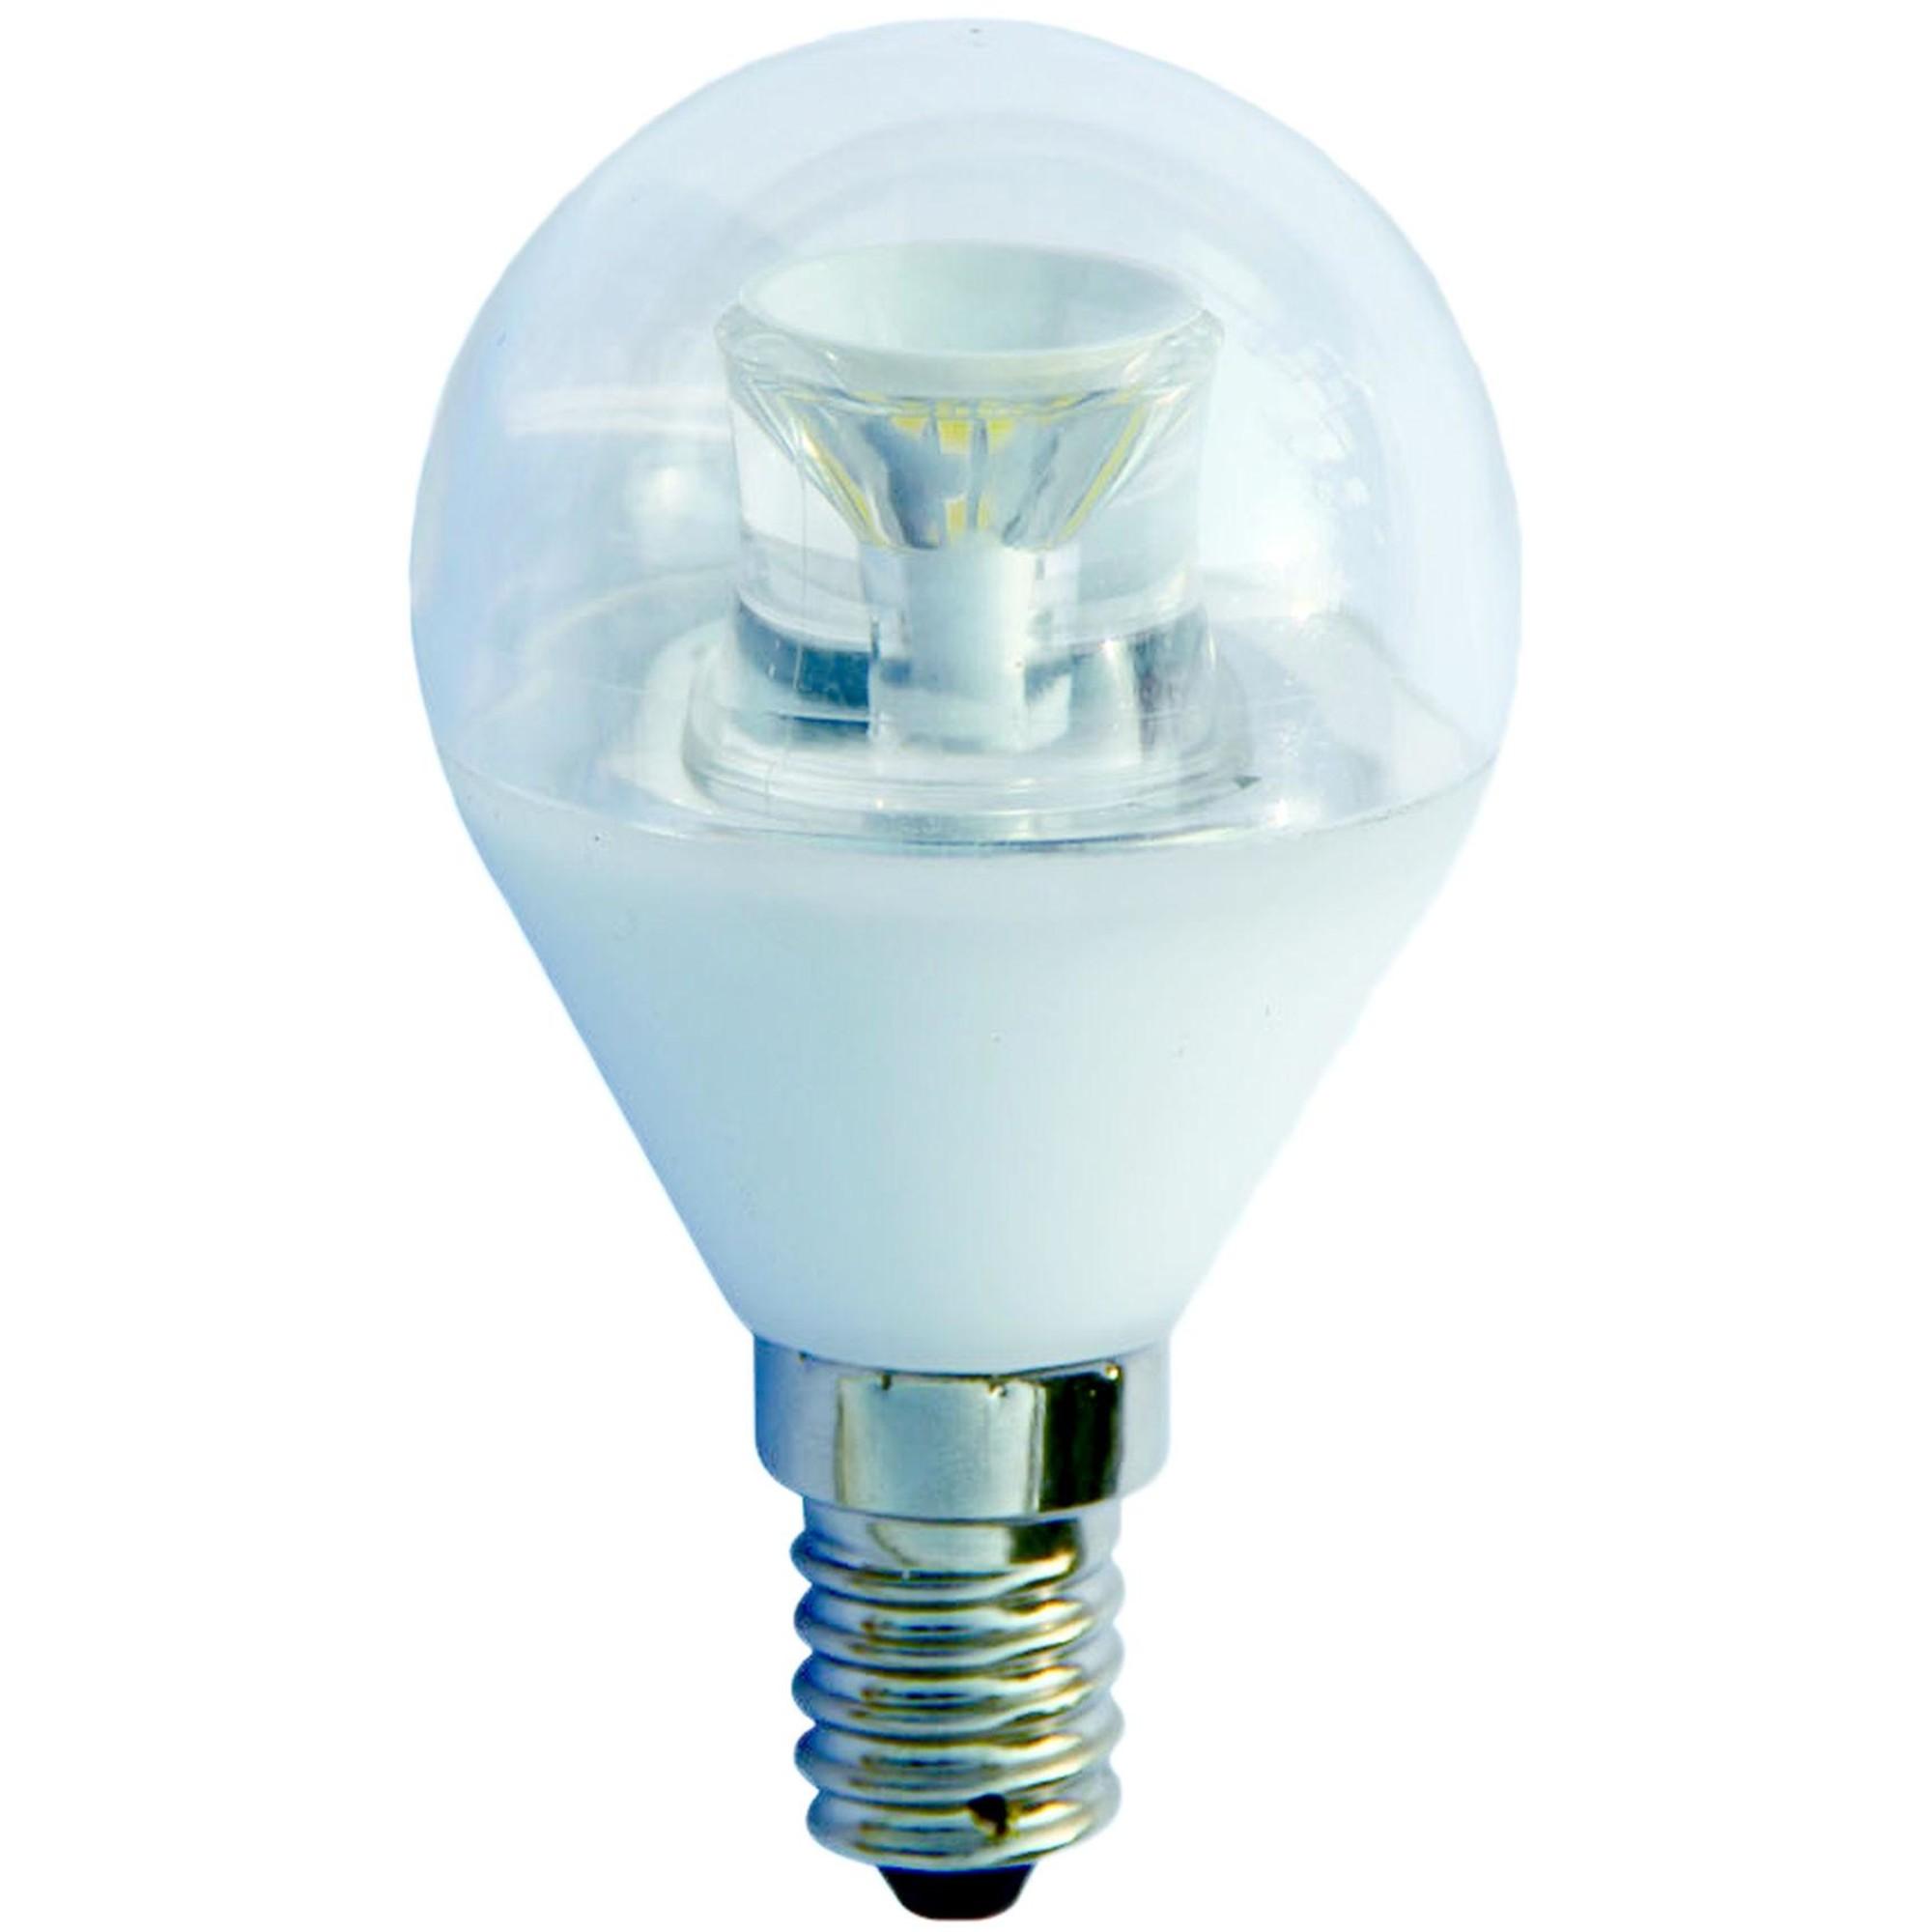 Лампа Ecola Premium светодионая E14 7 Вт шар 595 Лм теплый свет